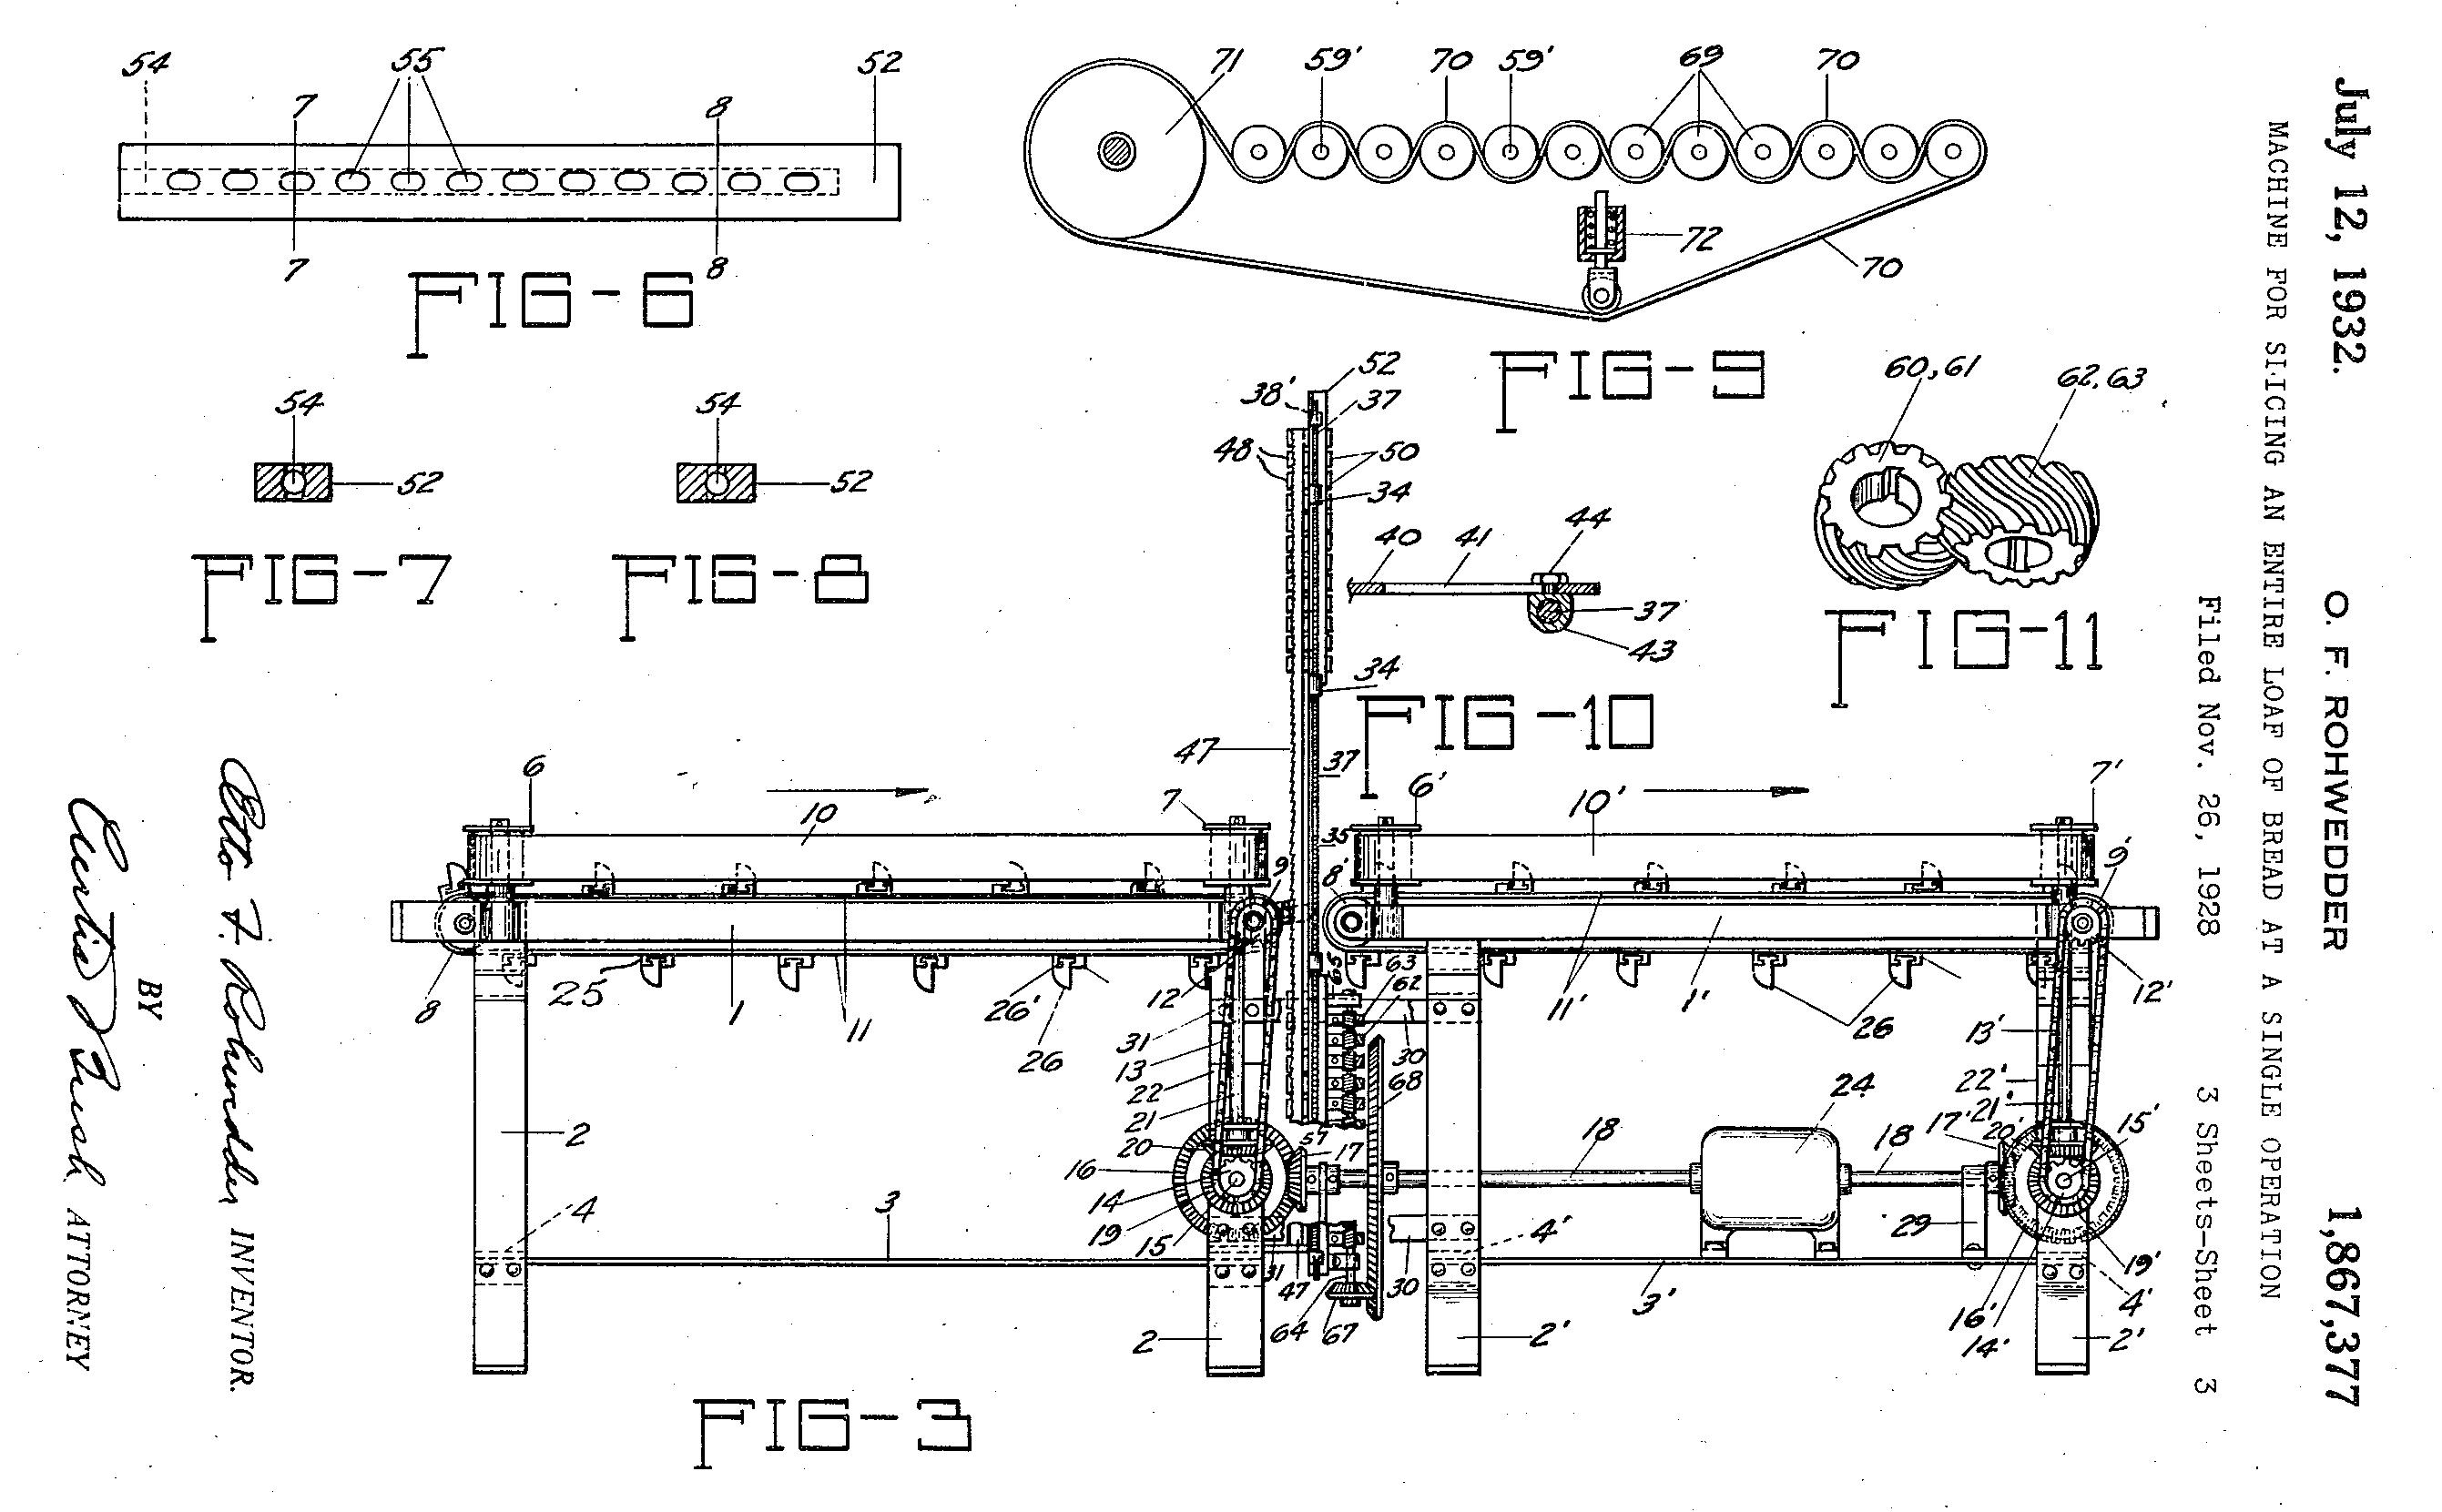 US1867377-2 patent claim Rohwedder